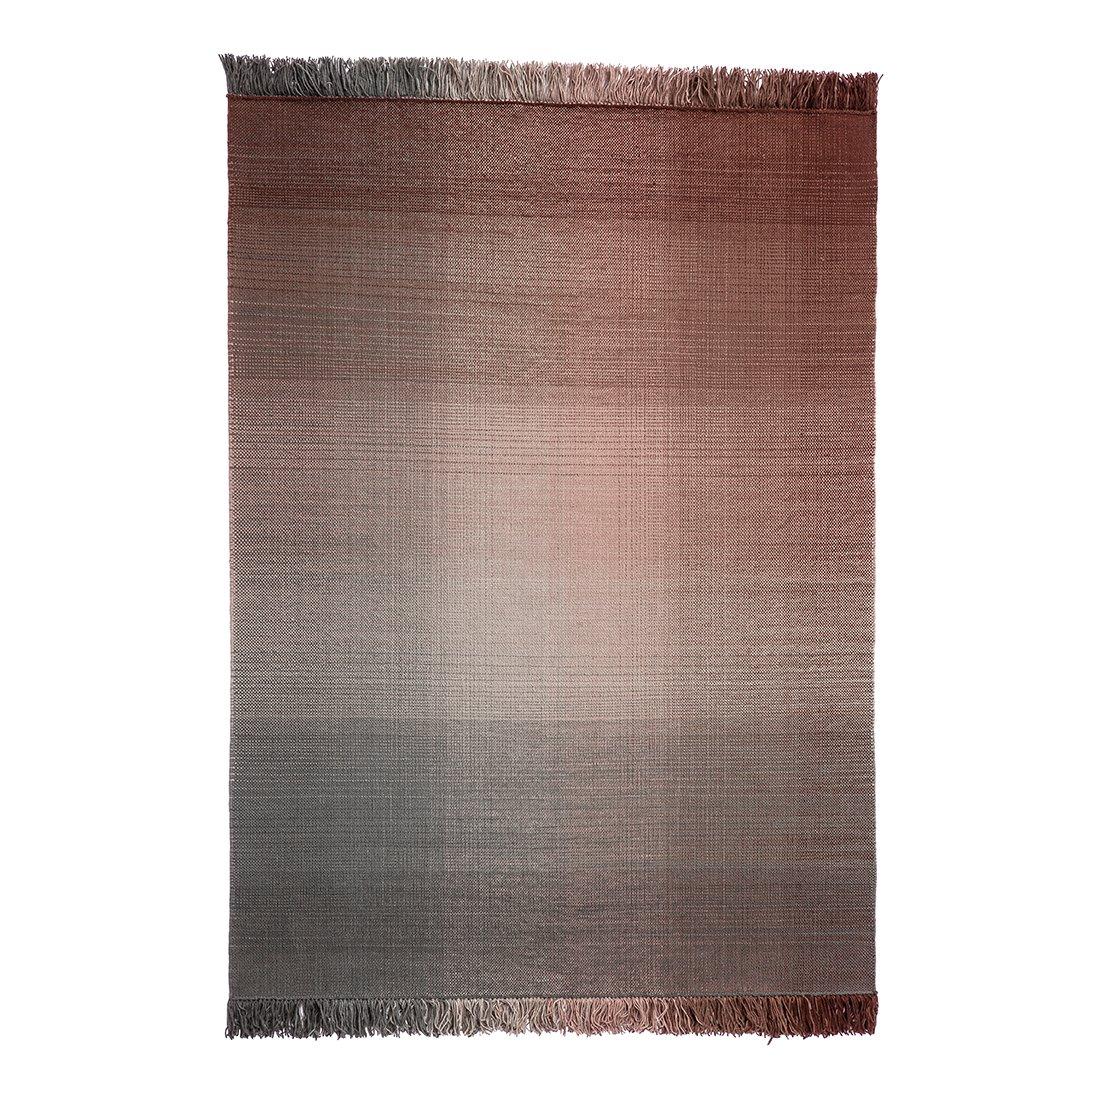 Nanimarquina Shade Vloerkleed Large - Palette 4